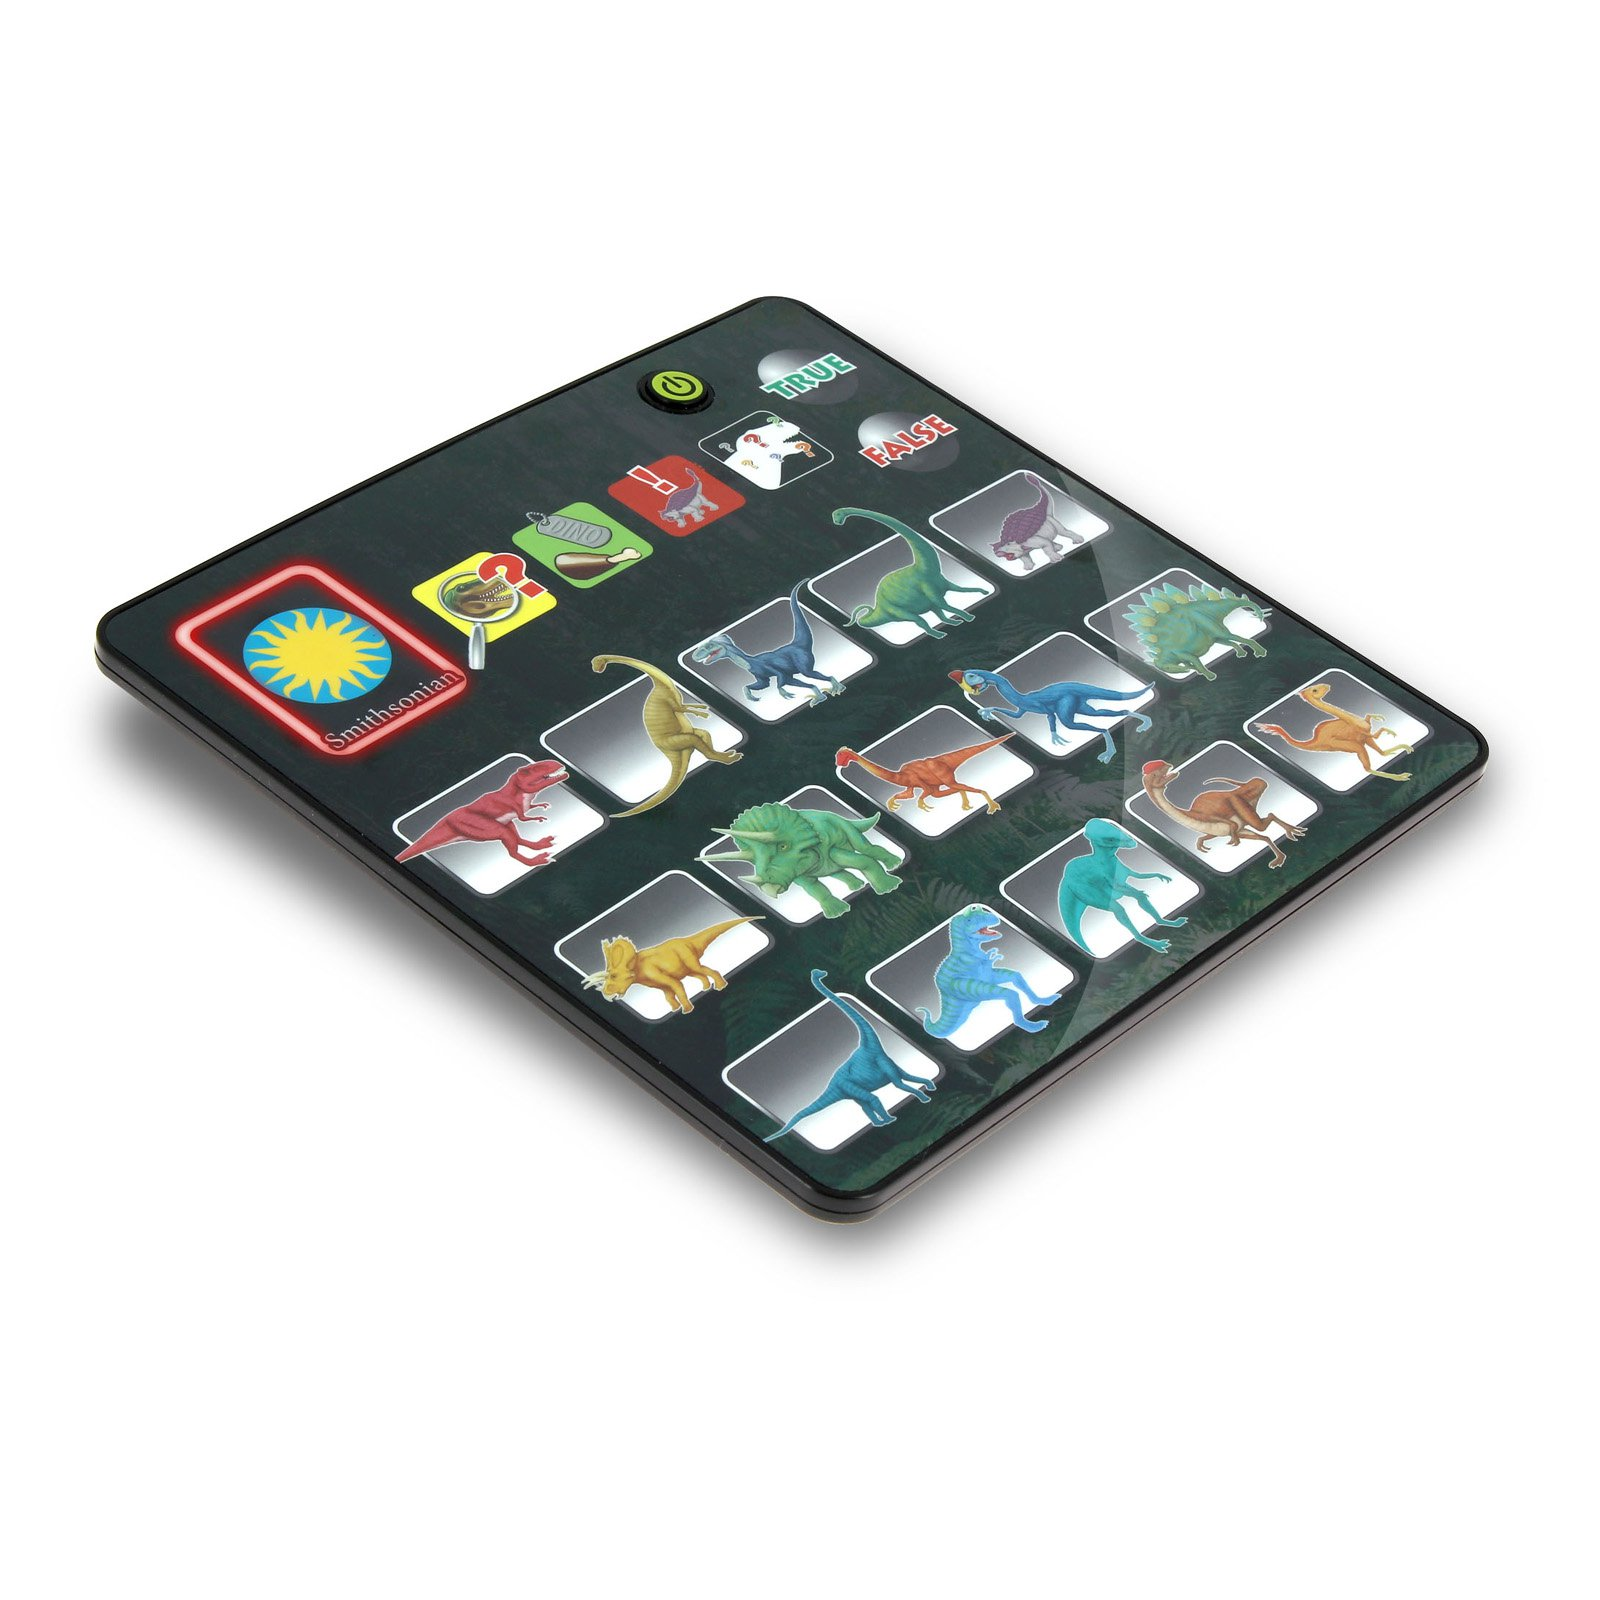 Kidz Delight Smithsonian Kids' Dino Tablet